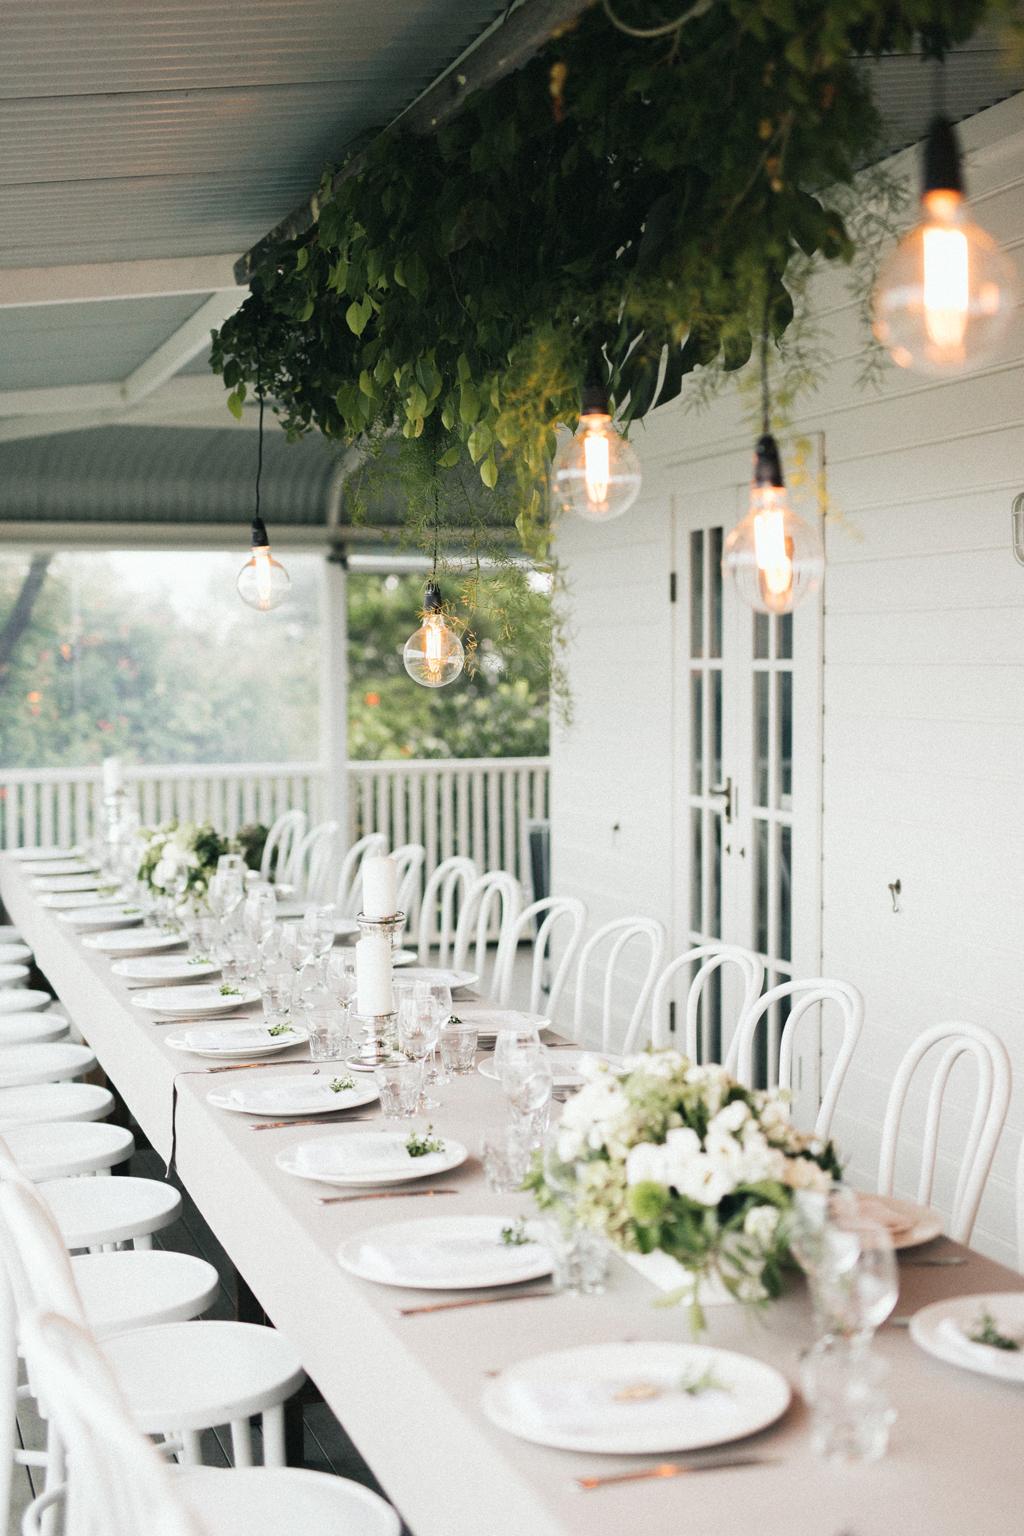 Byron Bay Wedding Photographer - Carly Tia Photography54.jpg